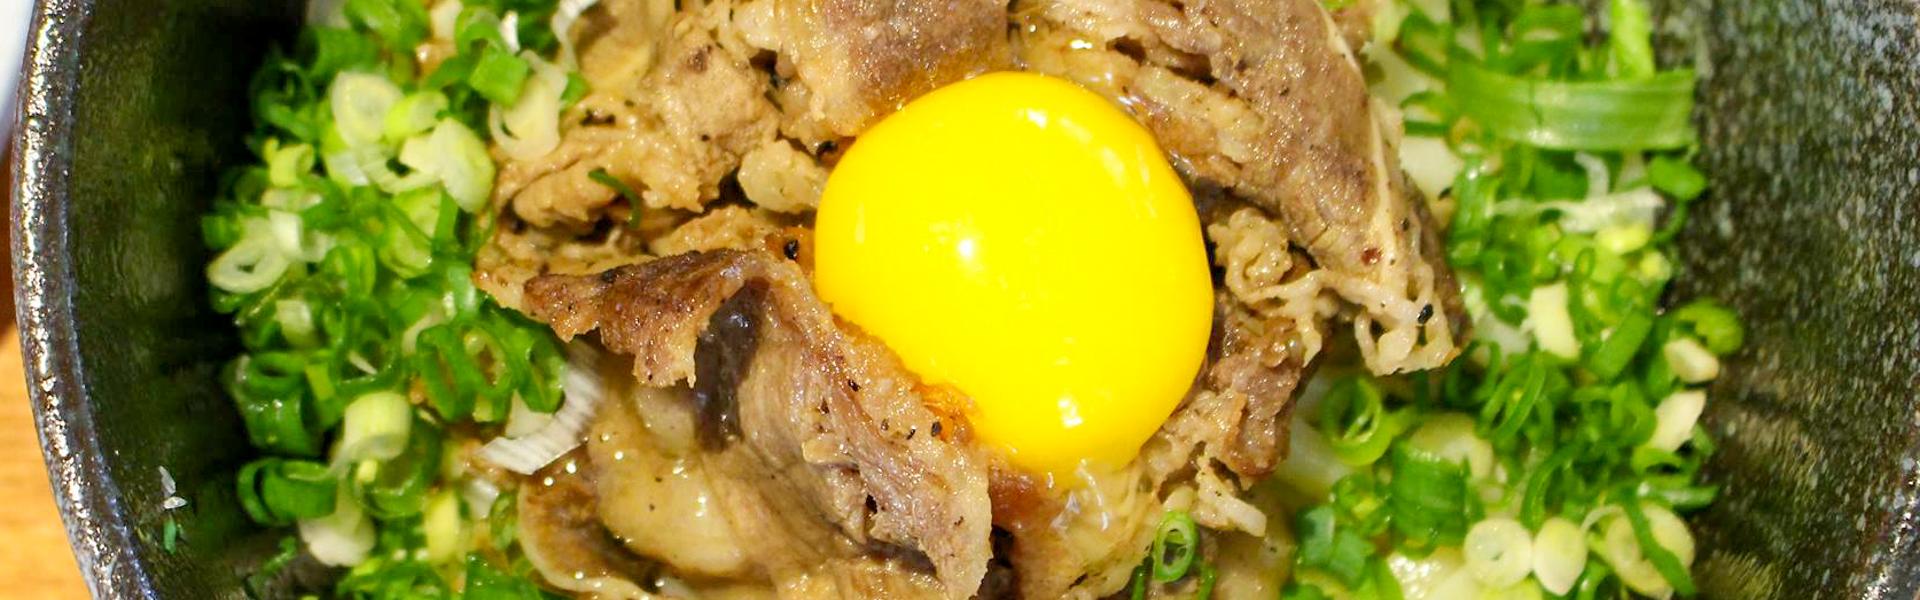 [ 南京三民站美食 ] 暮暮うどん~巷弄間的日式小店,彈牙烏龍麵搭和牛與香酥炸物